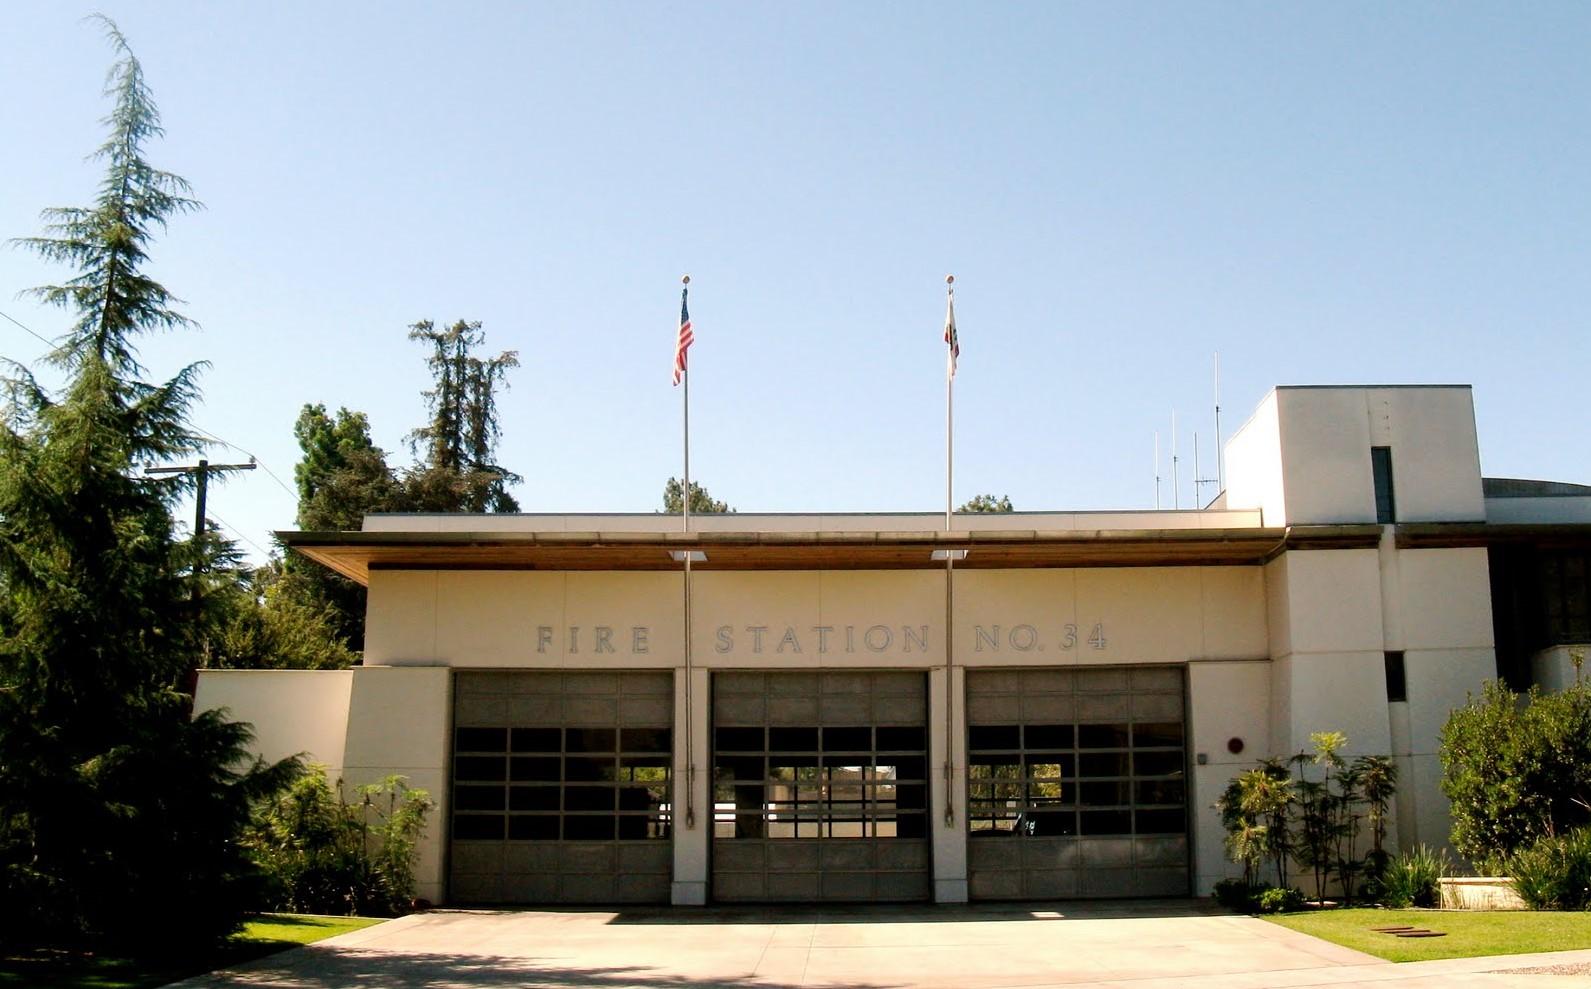 Pasadena Fire Station #34